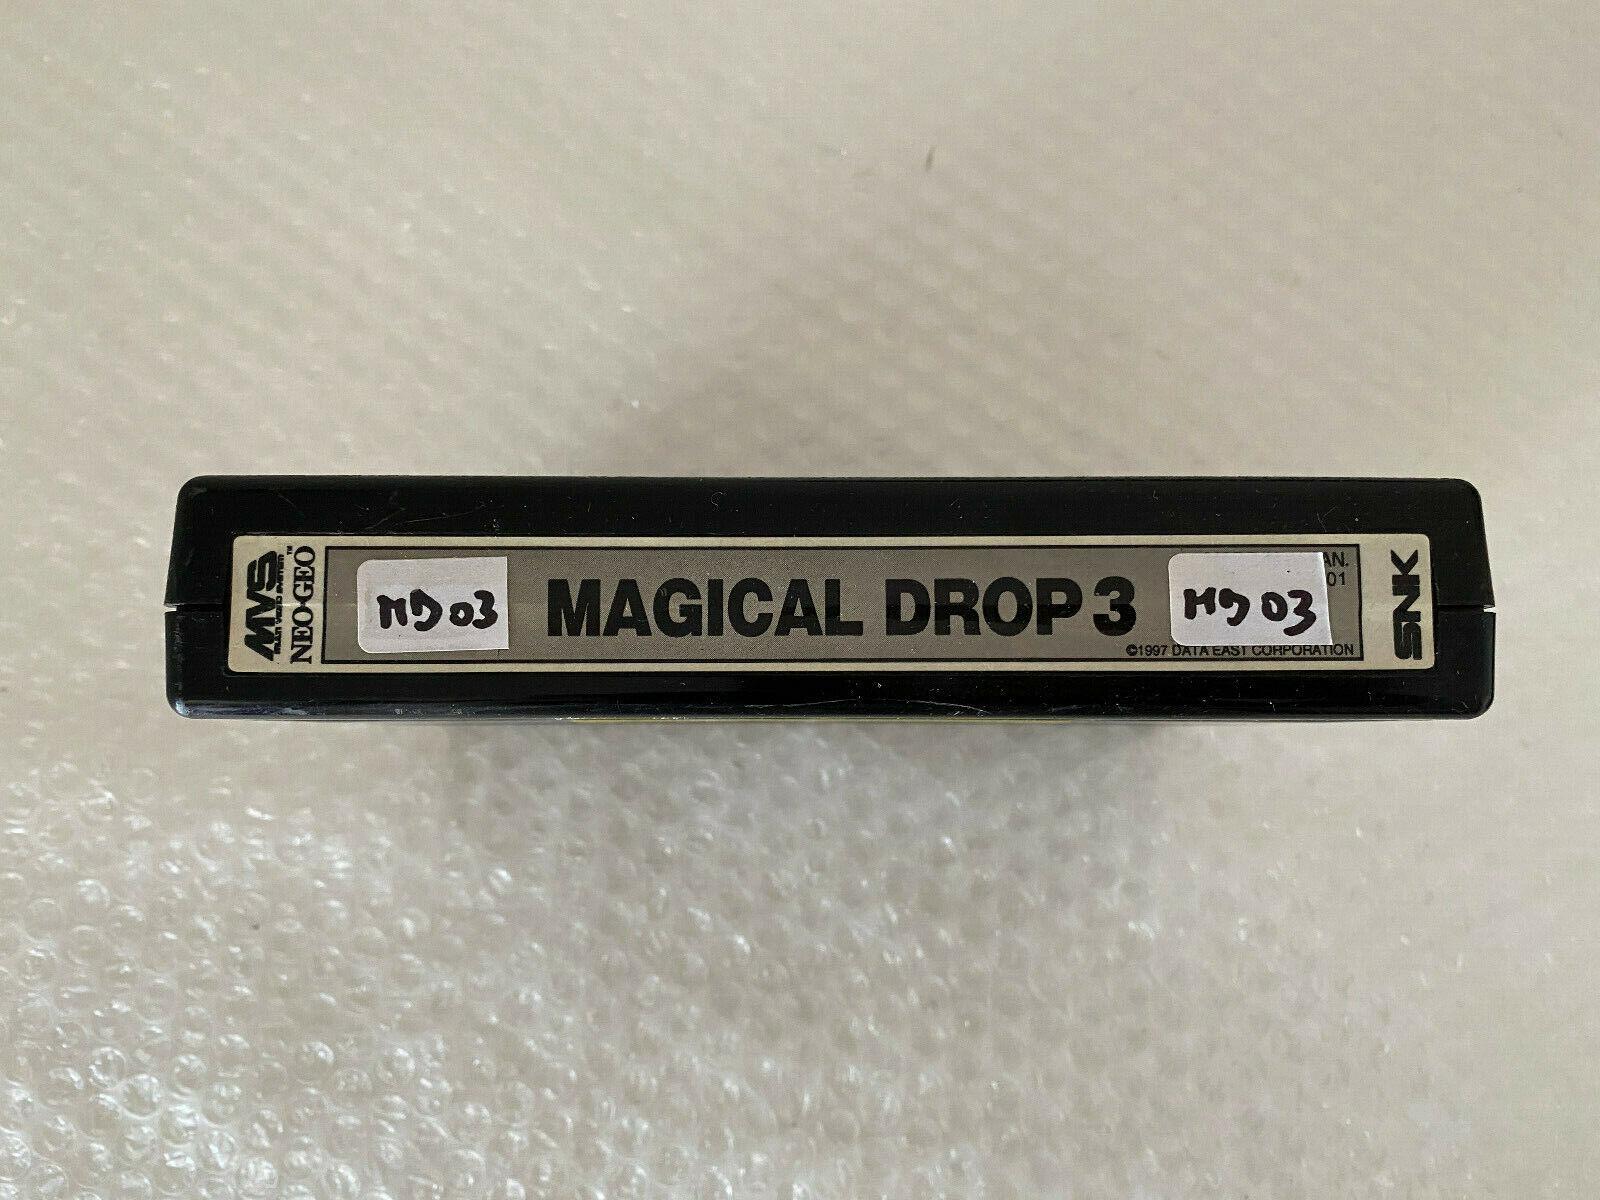 Snk Neo Geo MAGICAL DROP 3 Mvs Hollographic Label Nmint condition 100% original